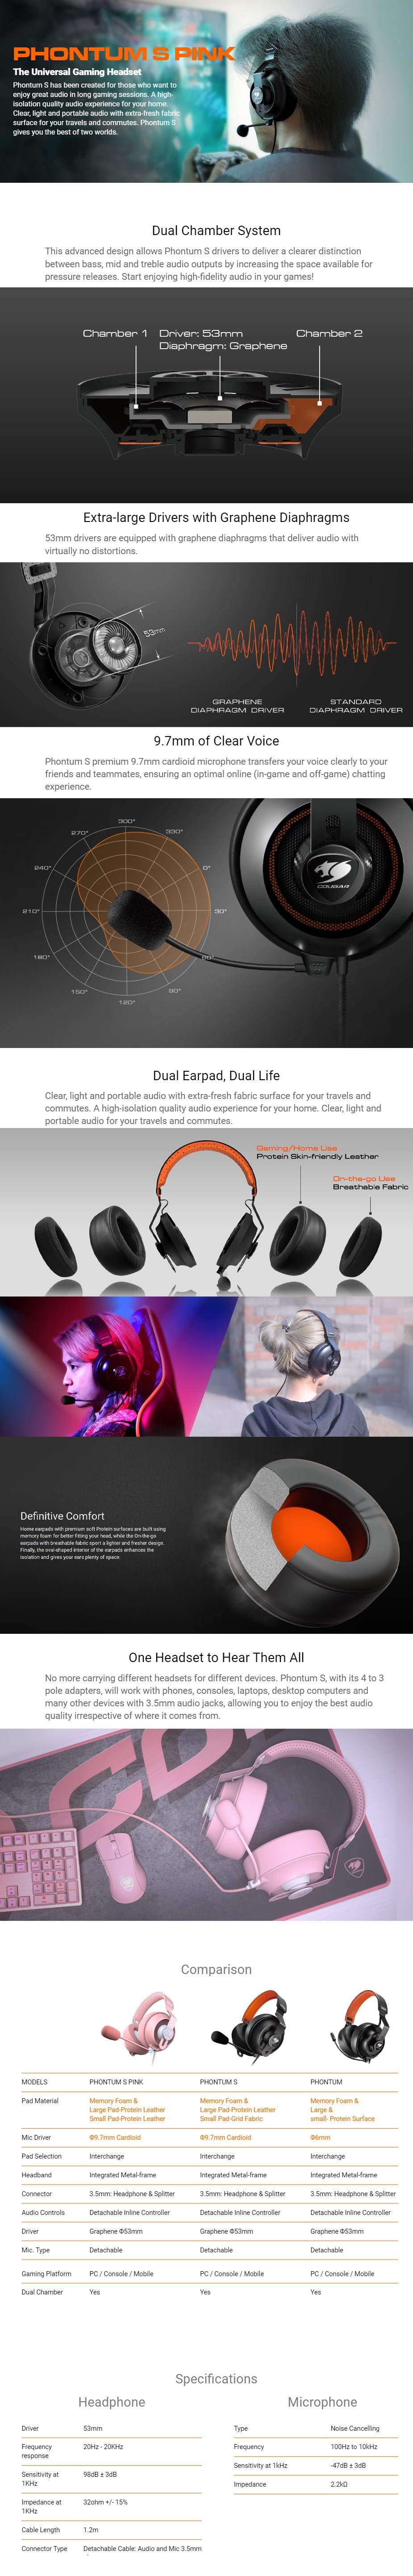 cougar-phontum-s-afawired-gaming-headset-pink-ac28826-6.jpg